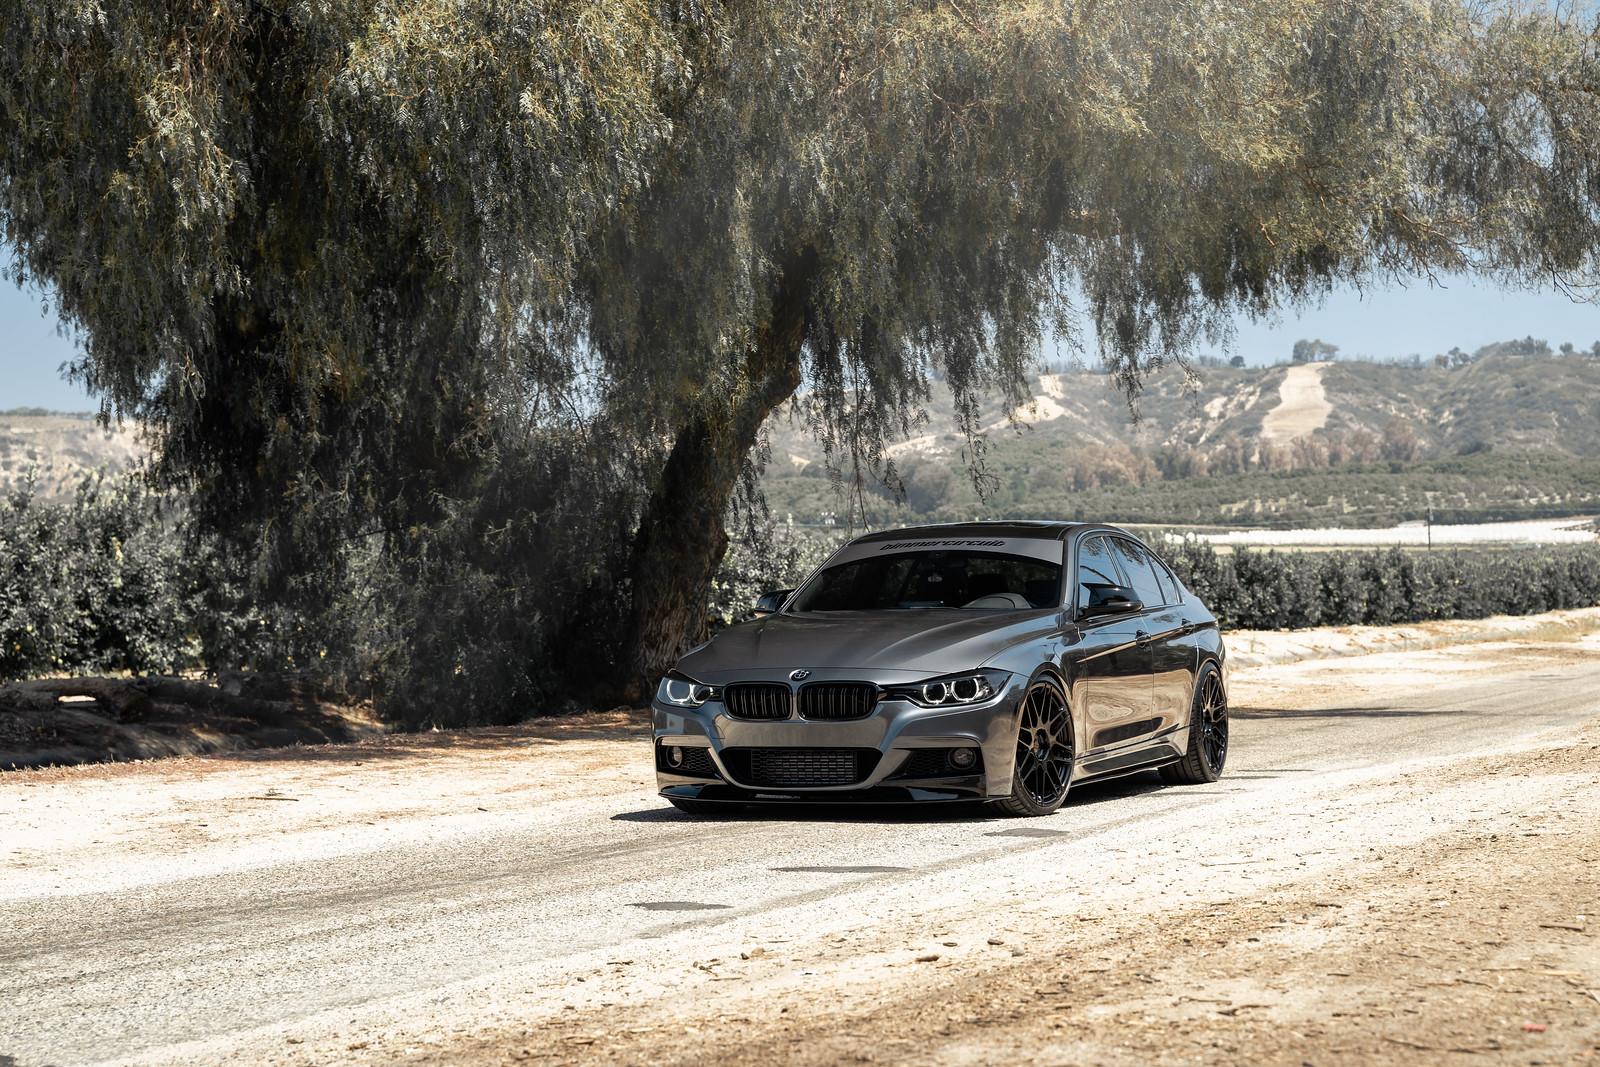 2015_BMW_335i_BDF12_Custom_Finish_Gloss_Black_3